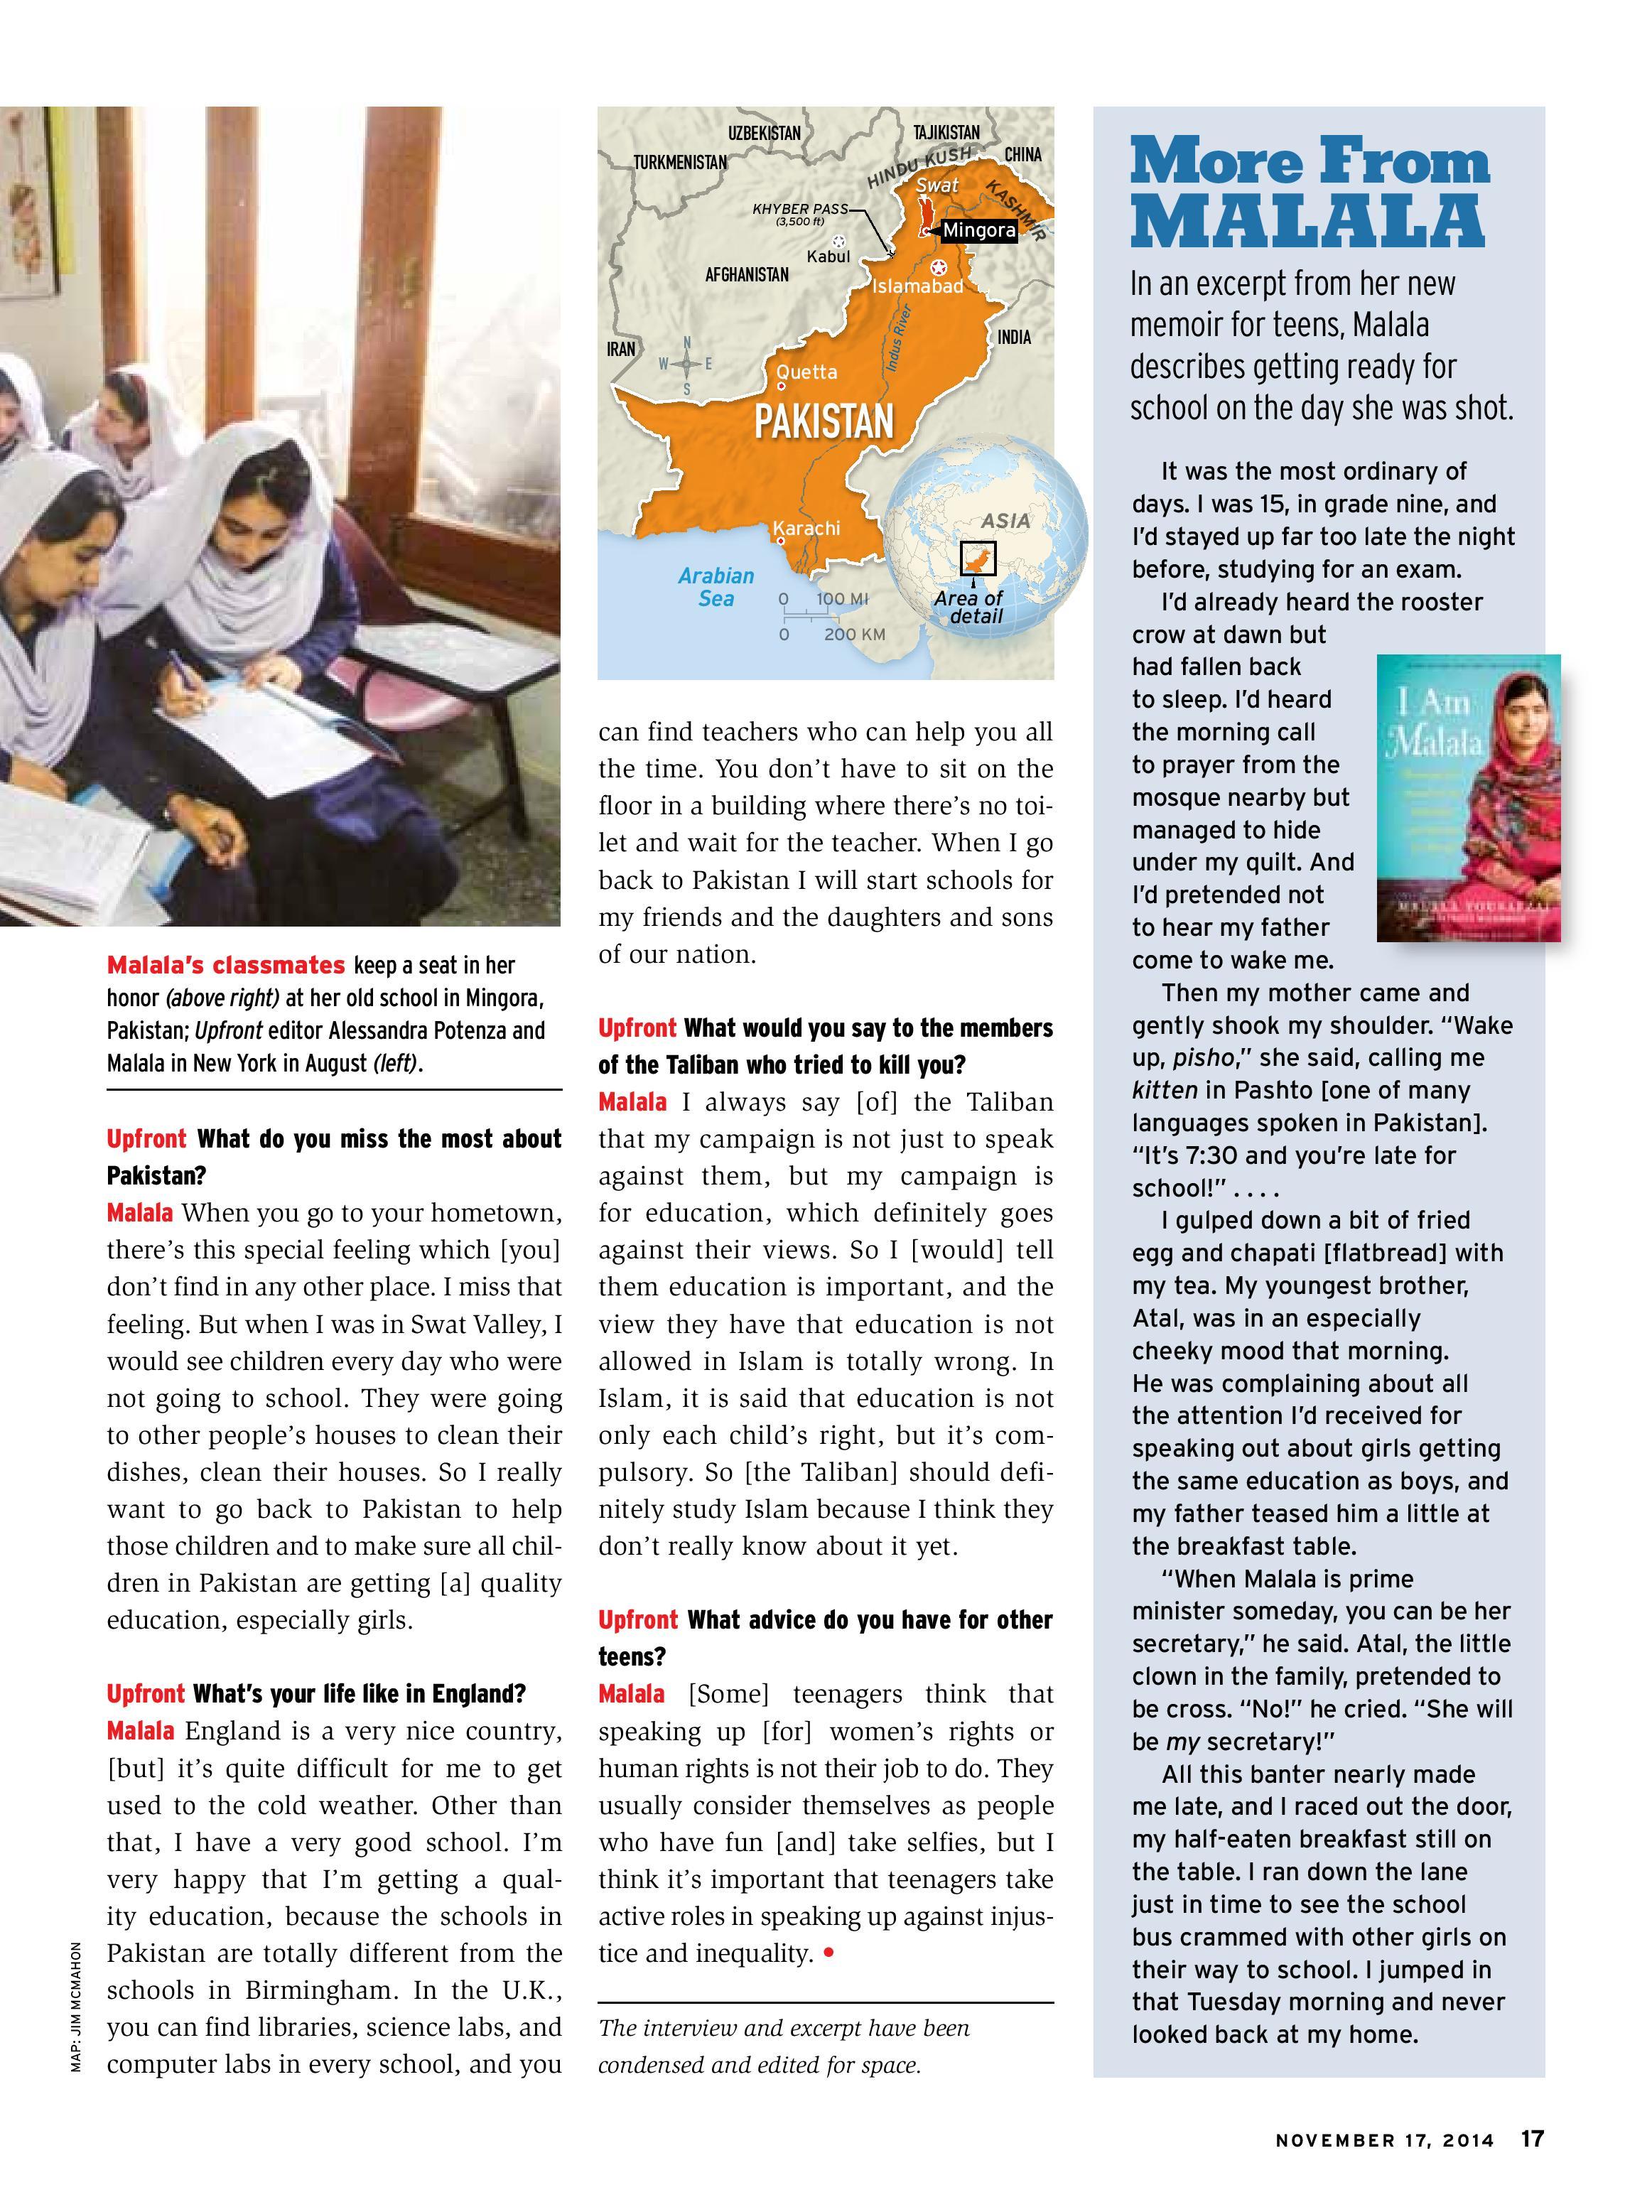 05-UPF-111714-Malala s mission-page-002.jpg